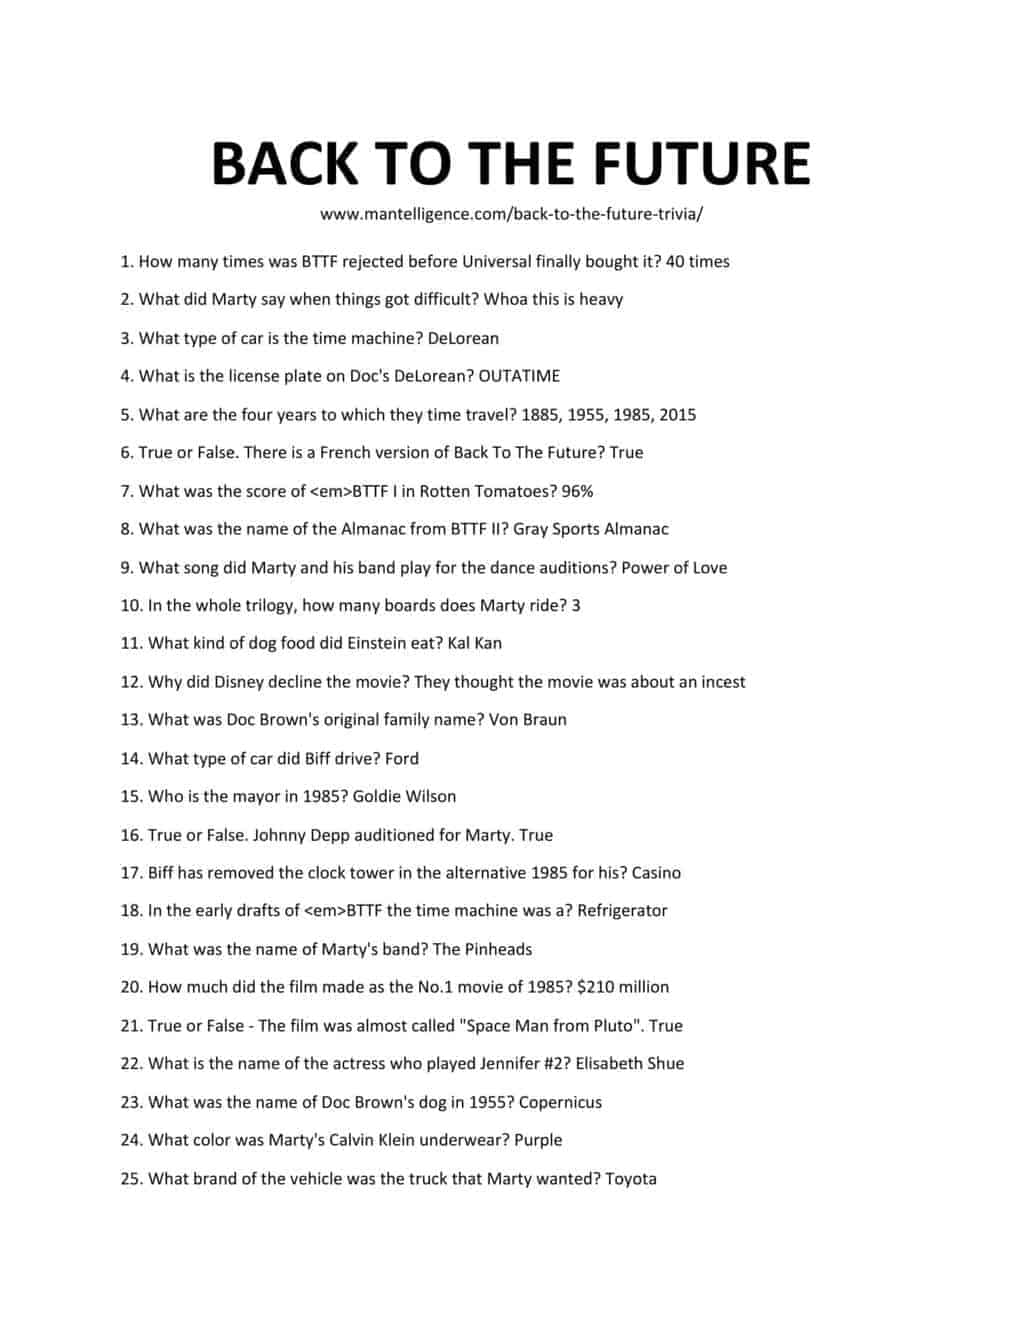 Downloadable and Printable jpg/pdf list of Beer Trivia